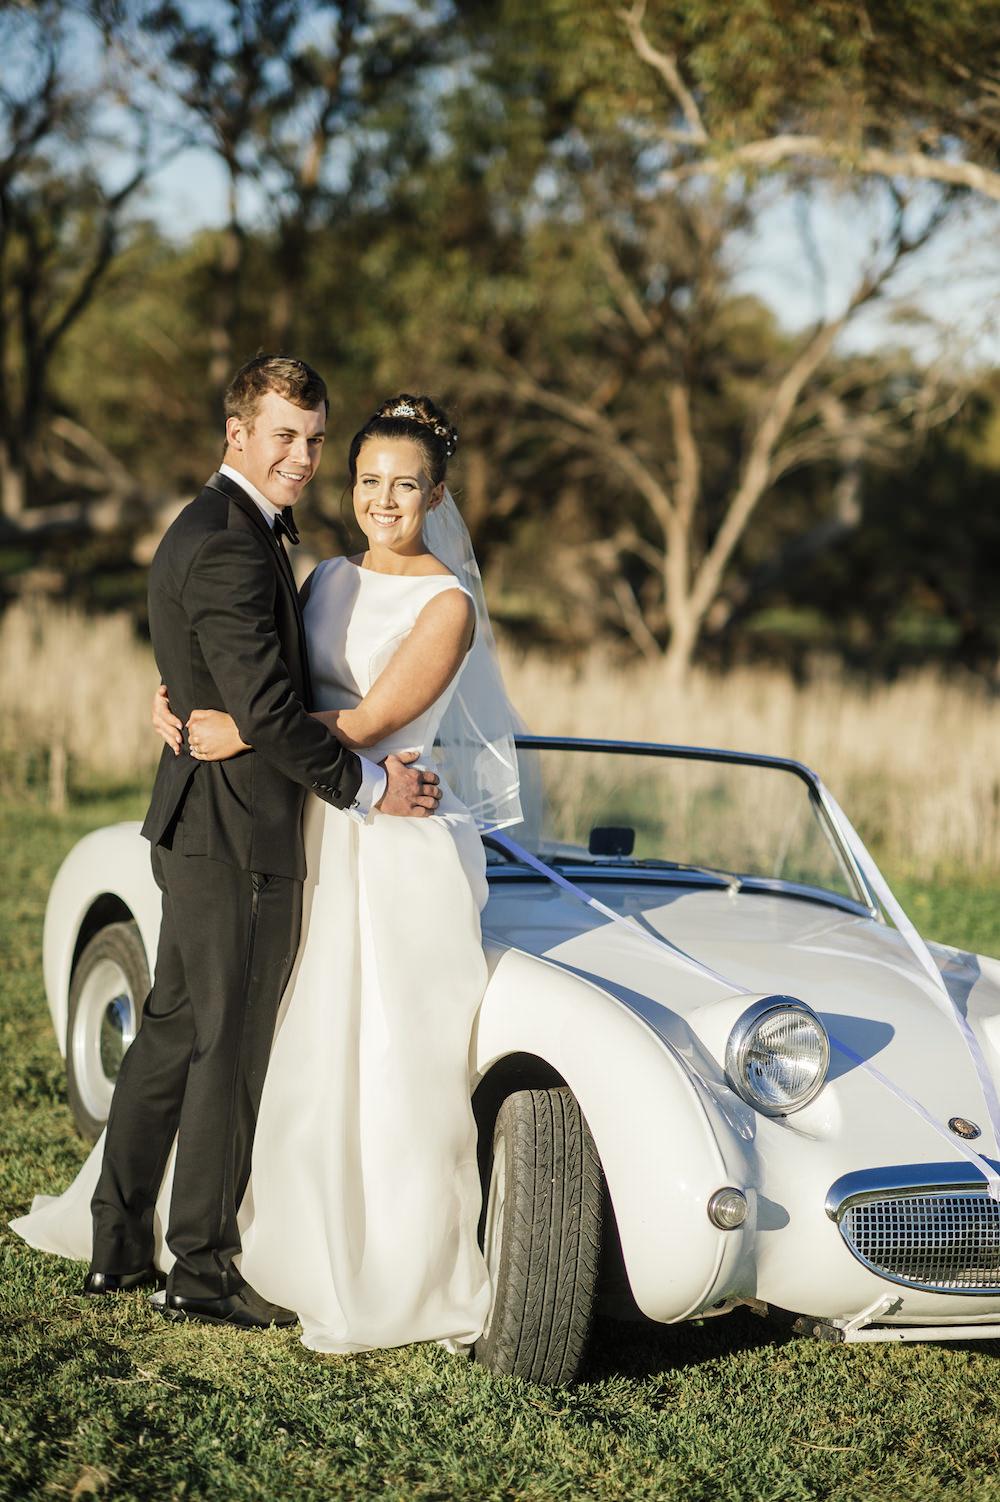 lindahamish-wedding-387.JPG